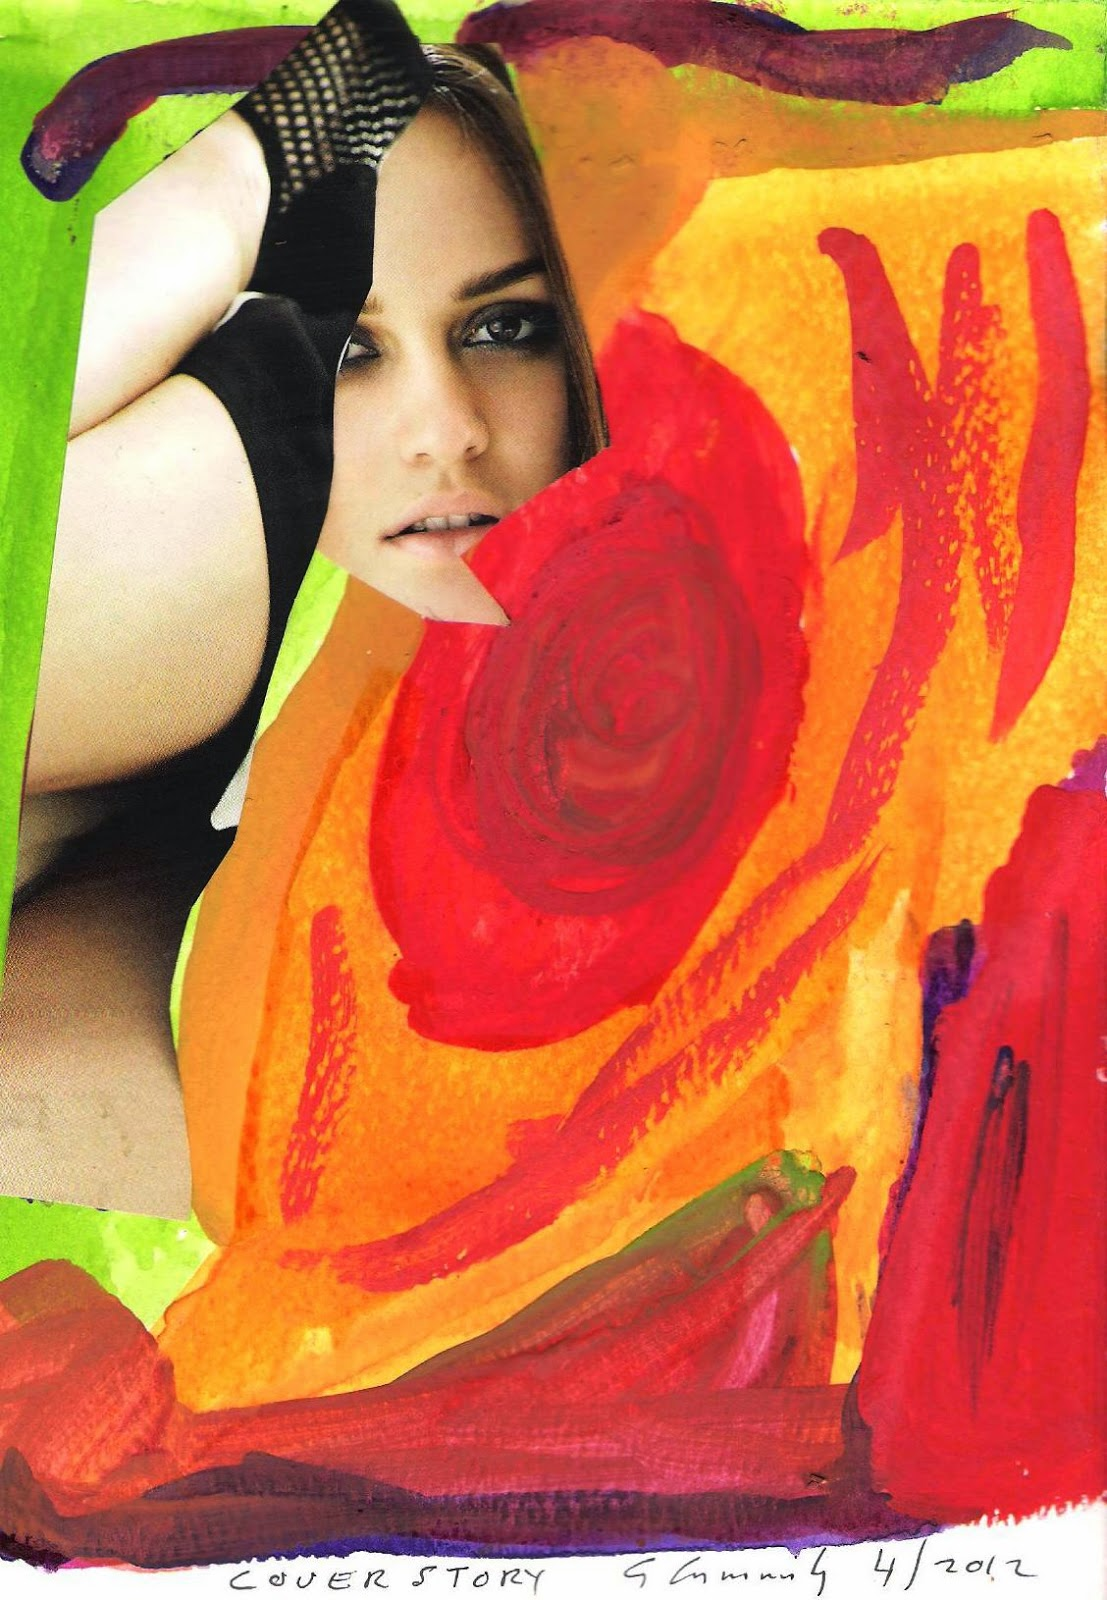 ls land nude models 2 5 Artworks by Gary Cummiskey